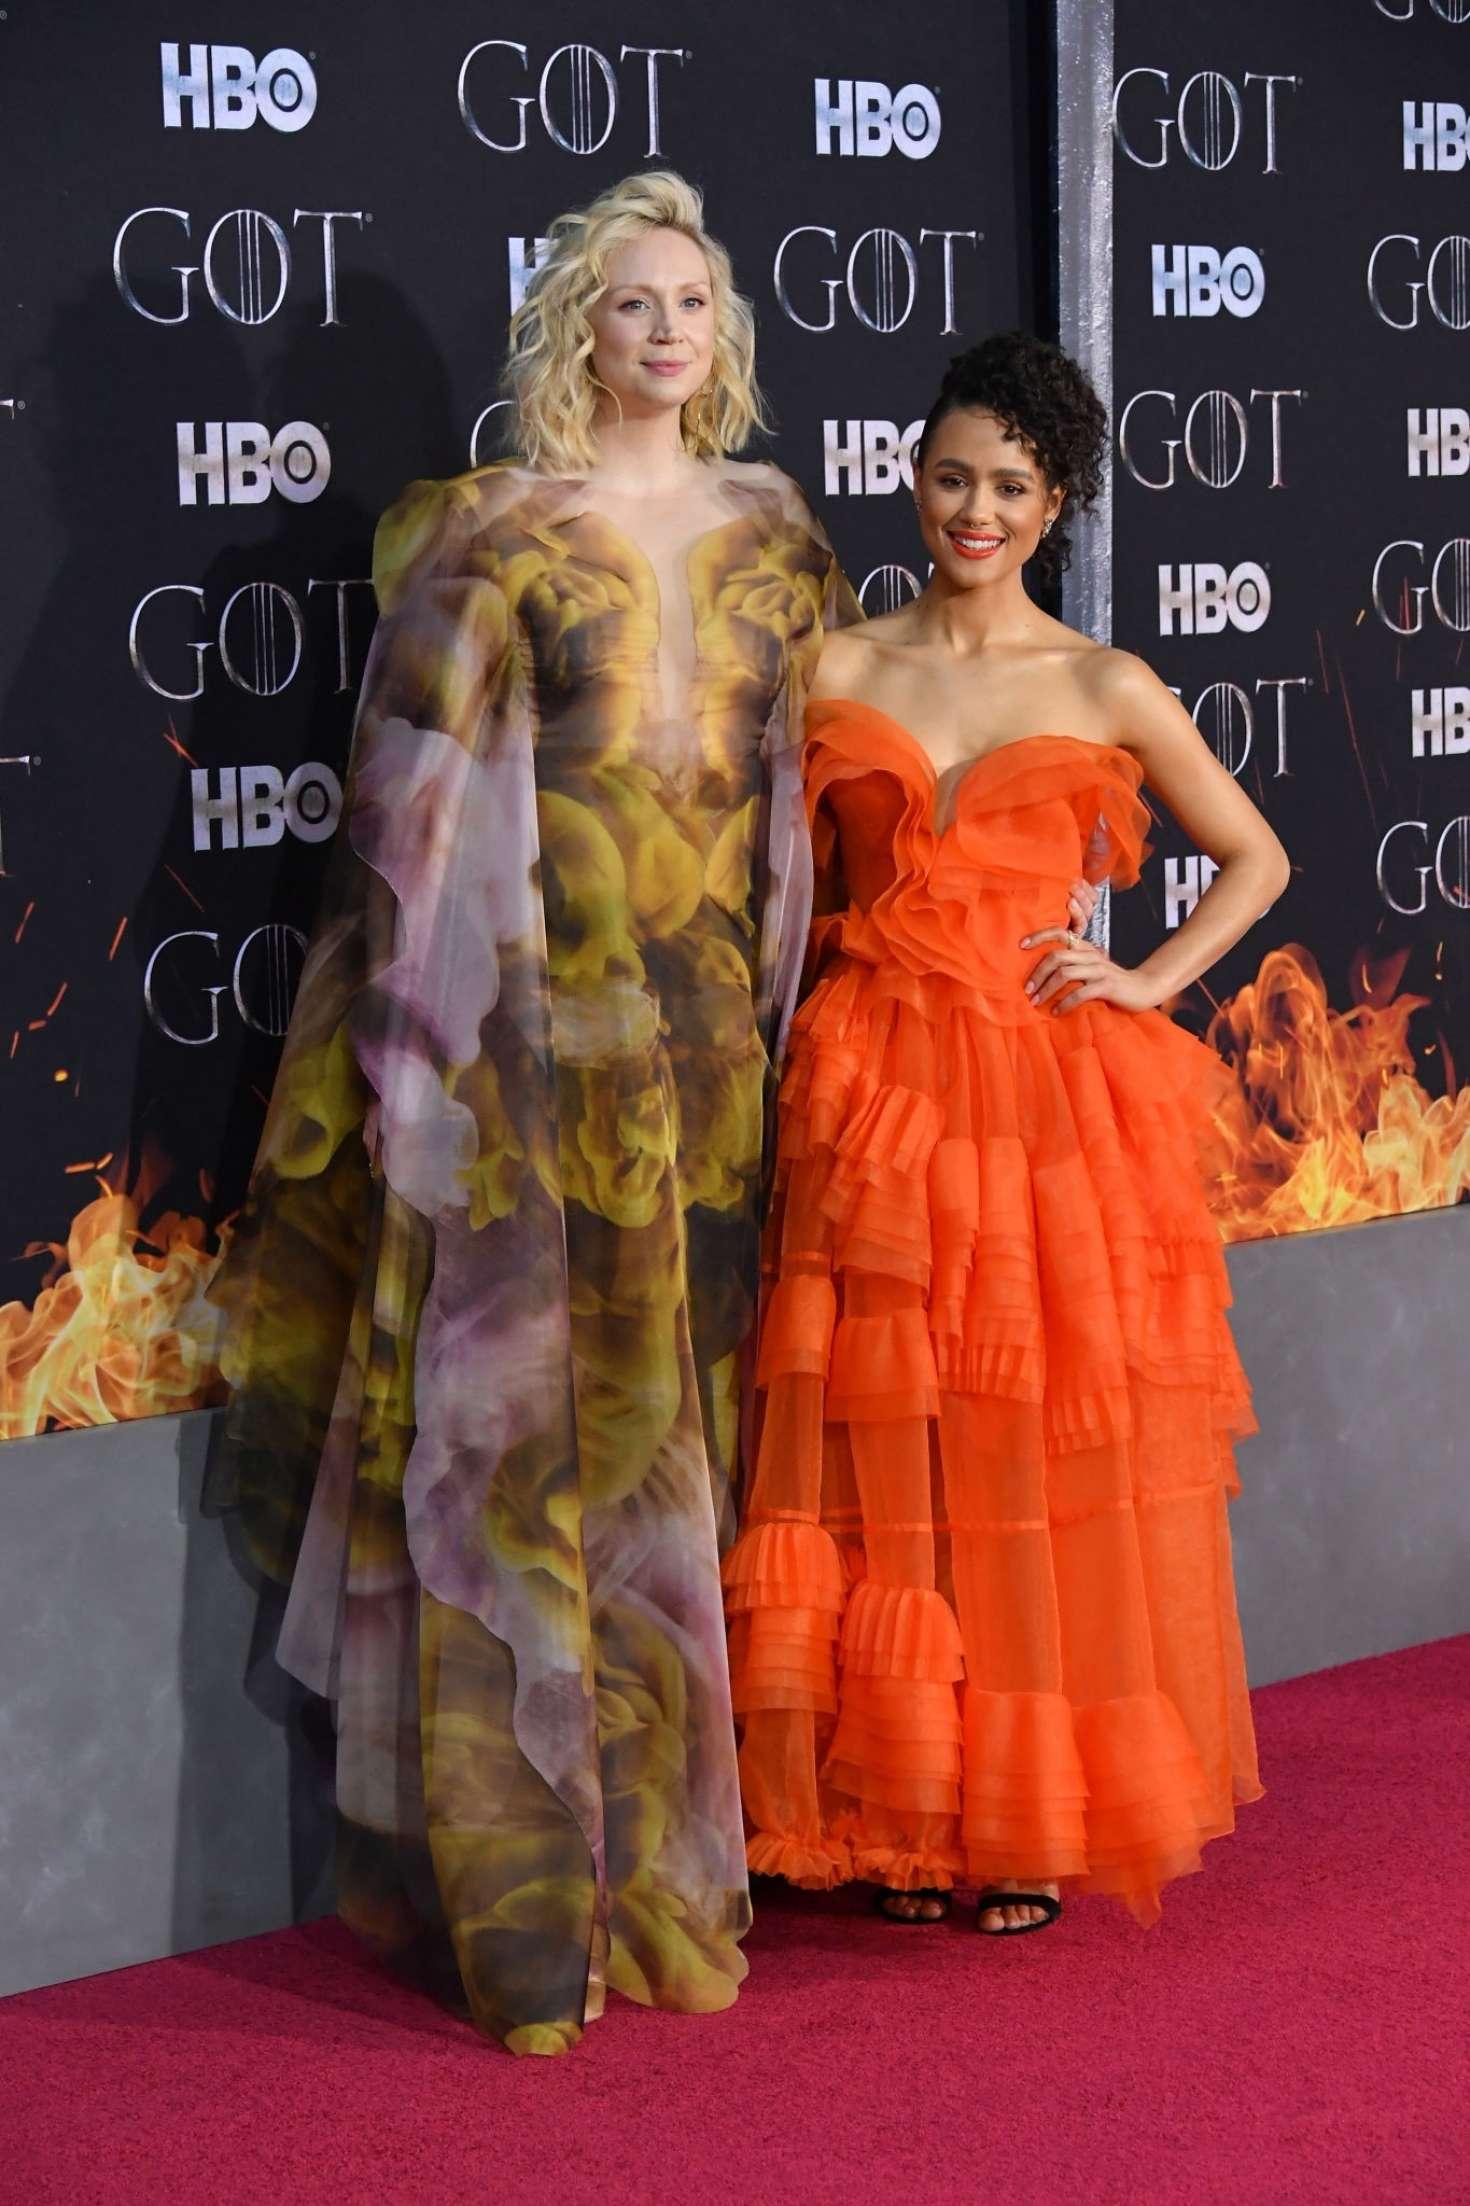 Nathalie Emmanuel 2019 : Nathalie Emmanuel: Game of Thrones Season 8 Premiere -08